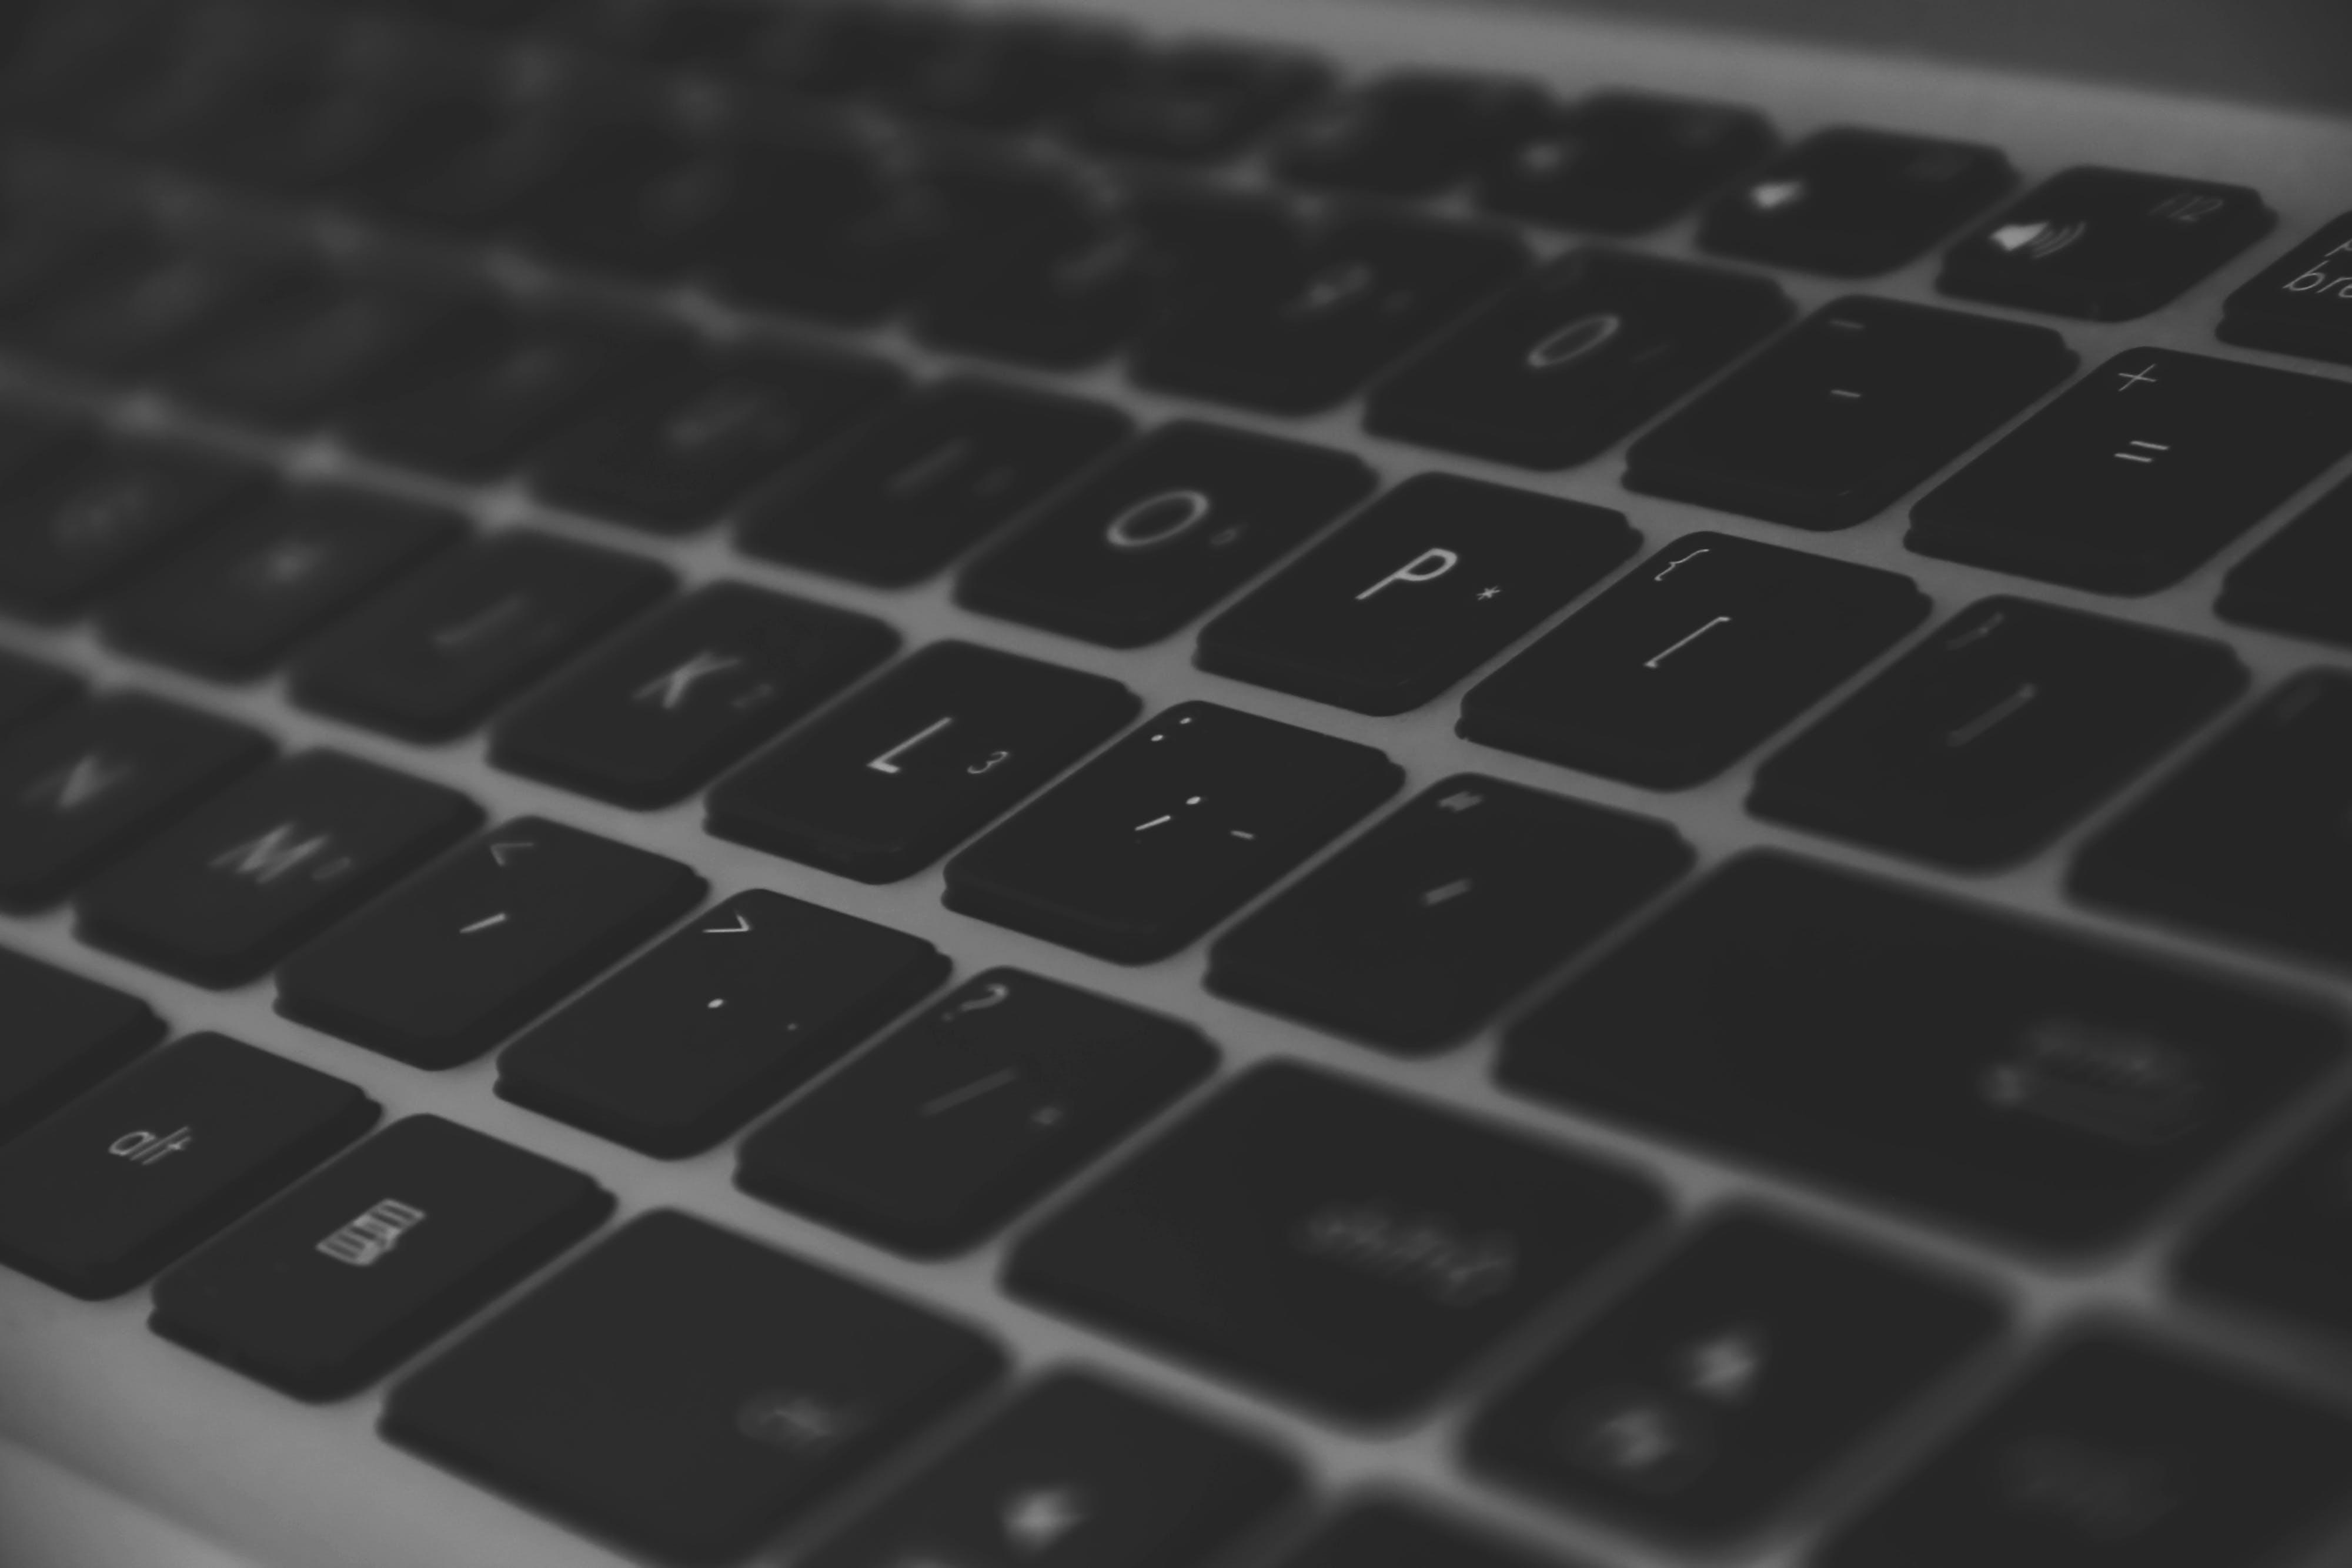 Closeup Photo of Macbook